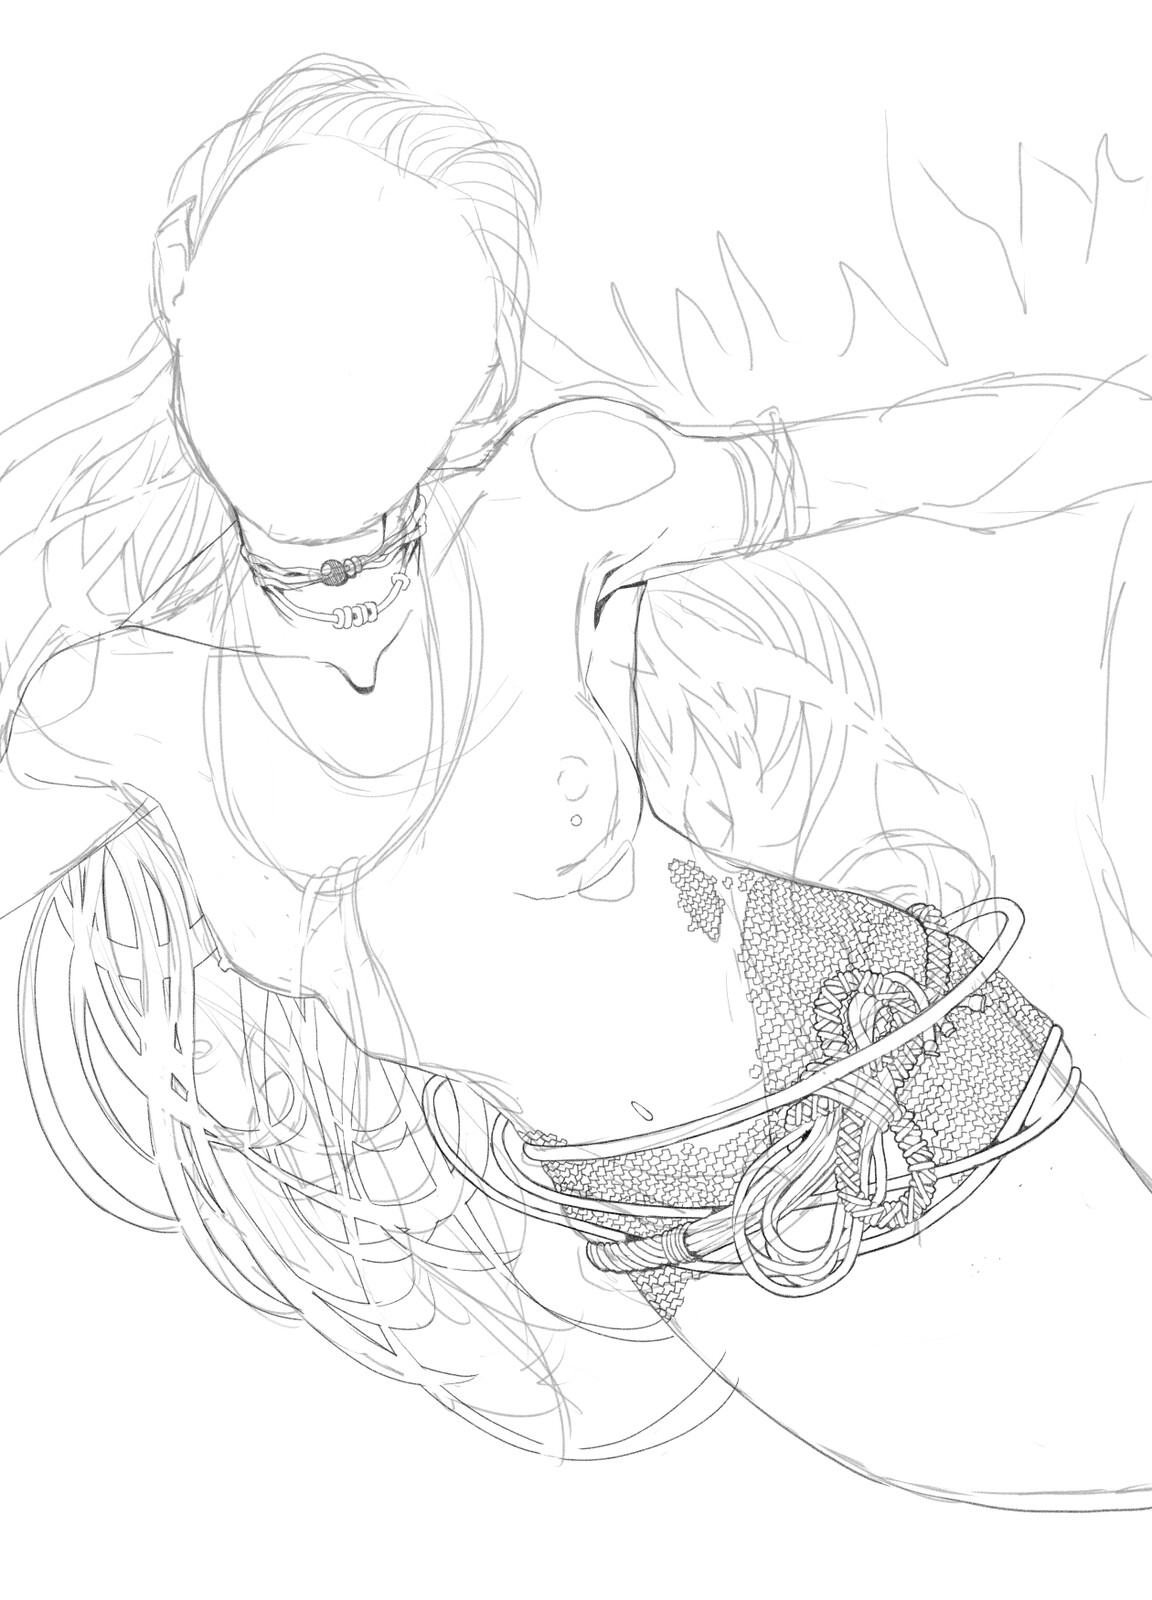 Process sketch 3